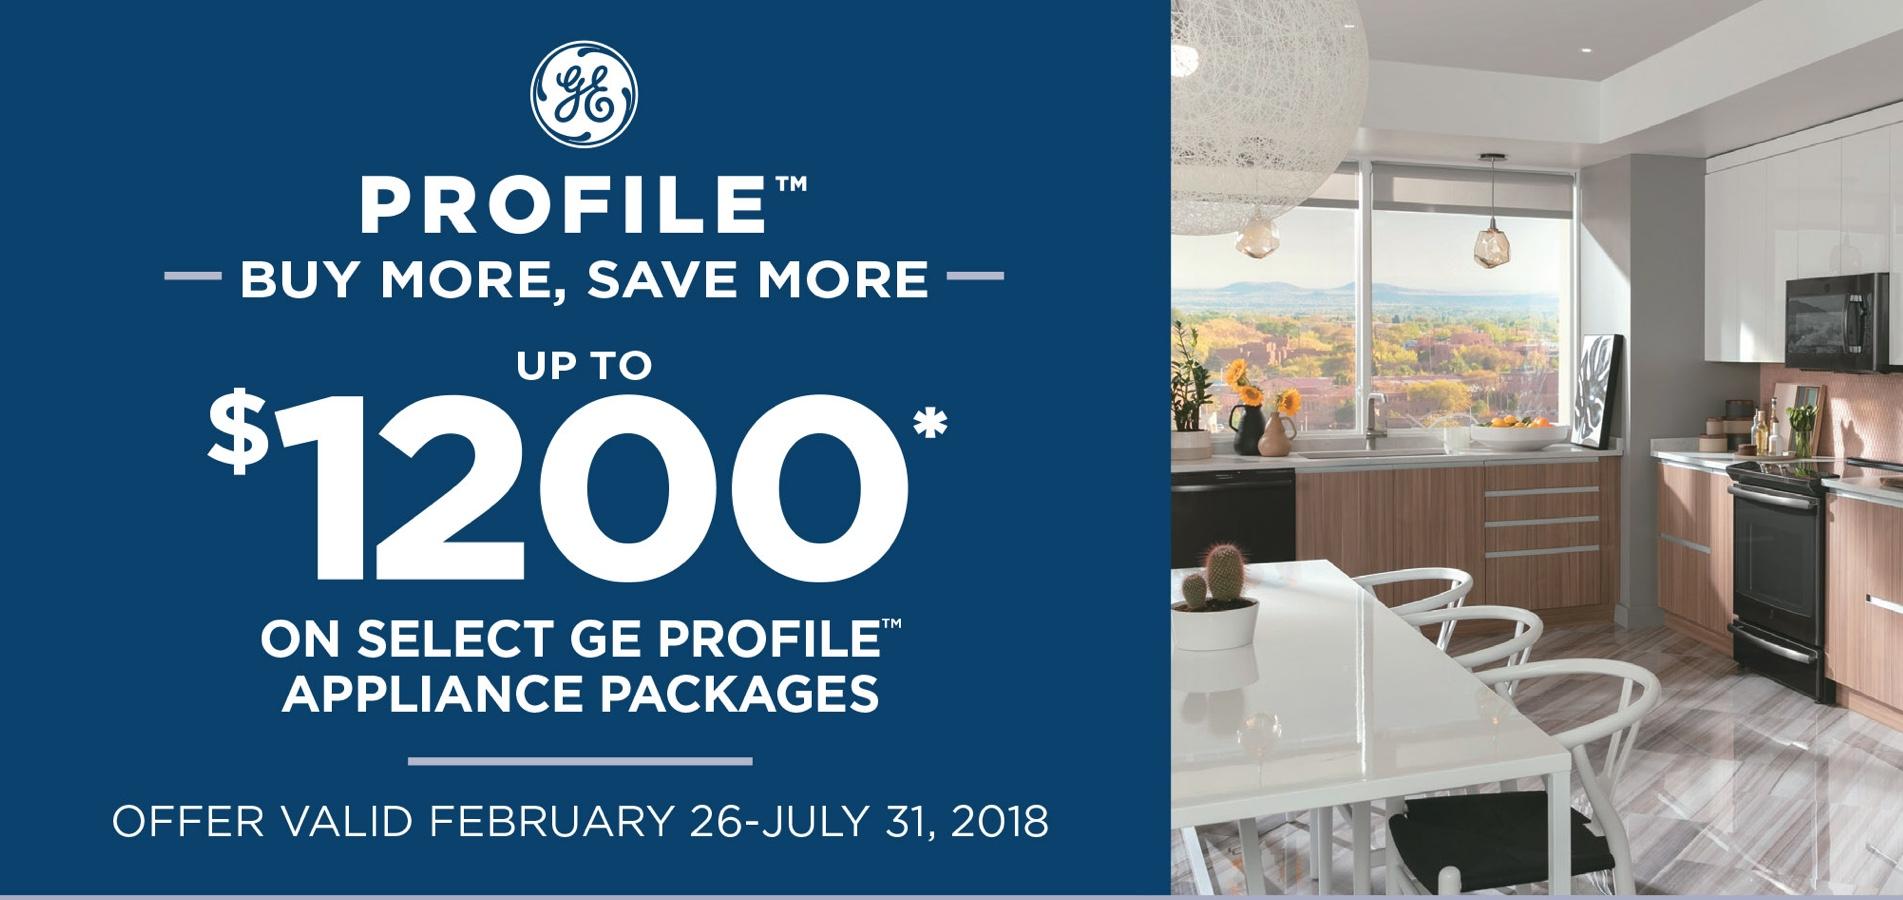 GE Profile Buy More Save More